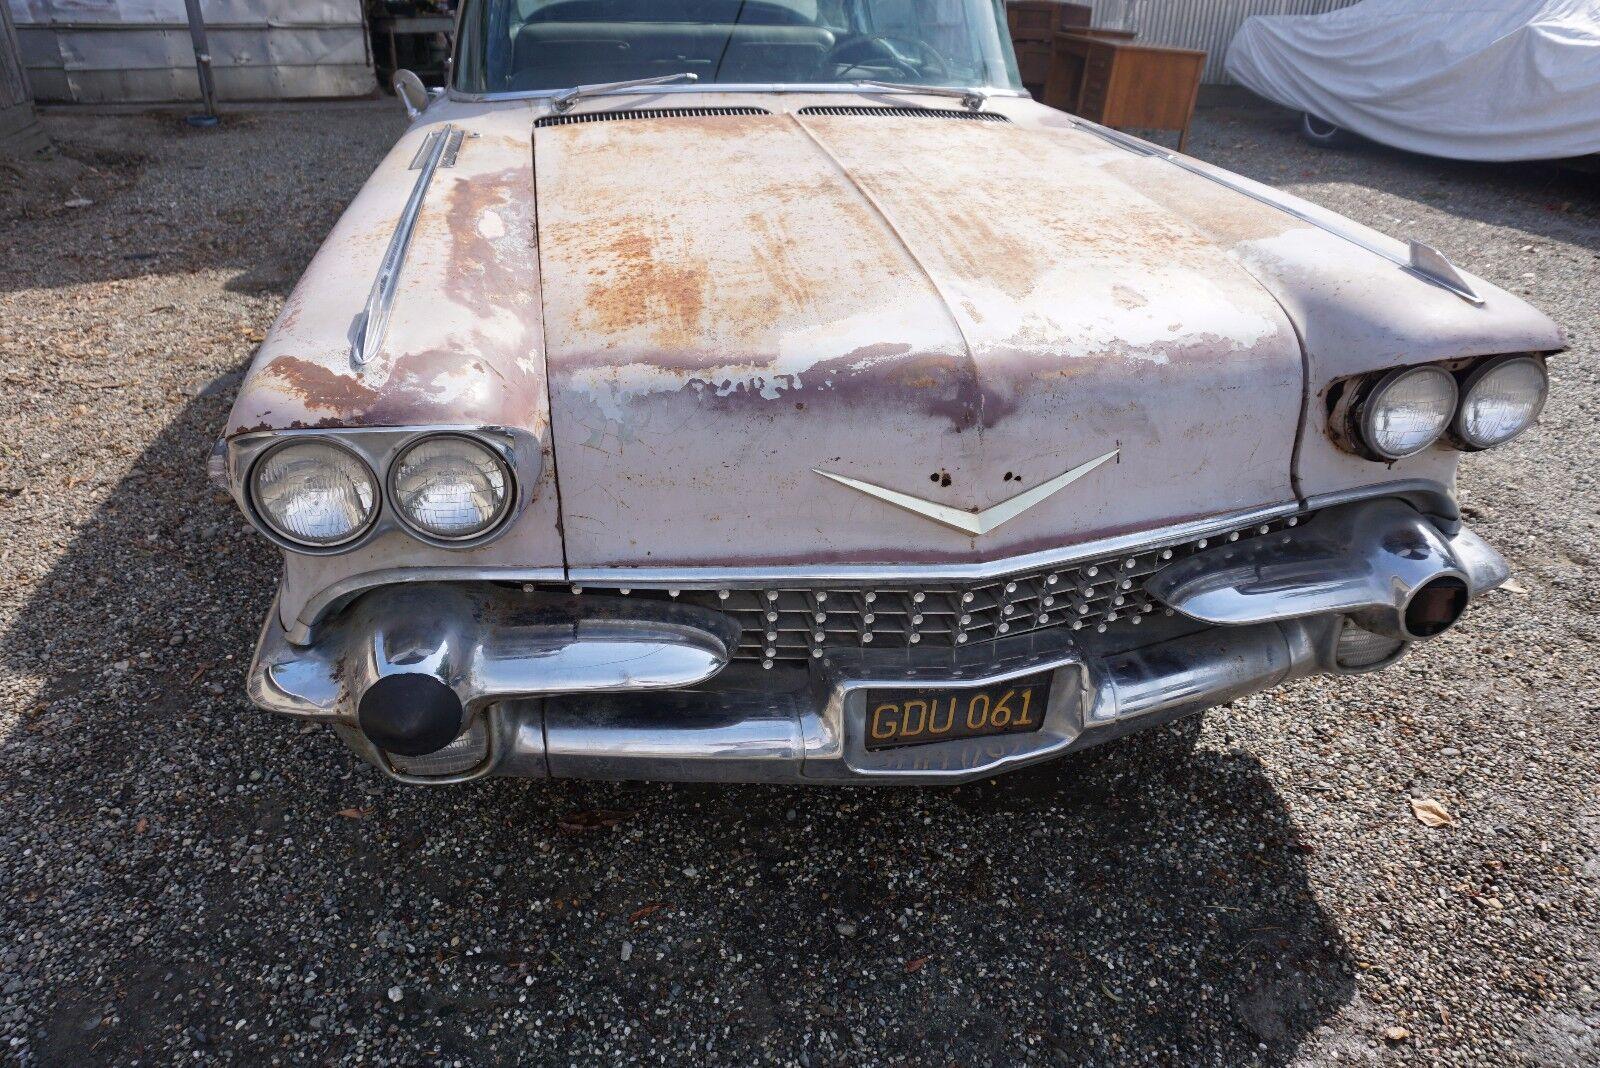 1958 Cadillac Fleetwood Sixty Special 1958 Cadillac Fleetwood Sixty Special